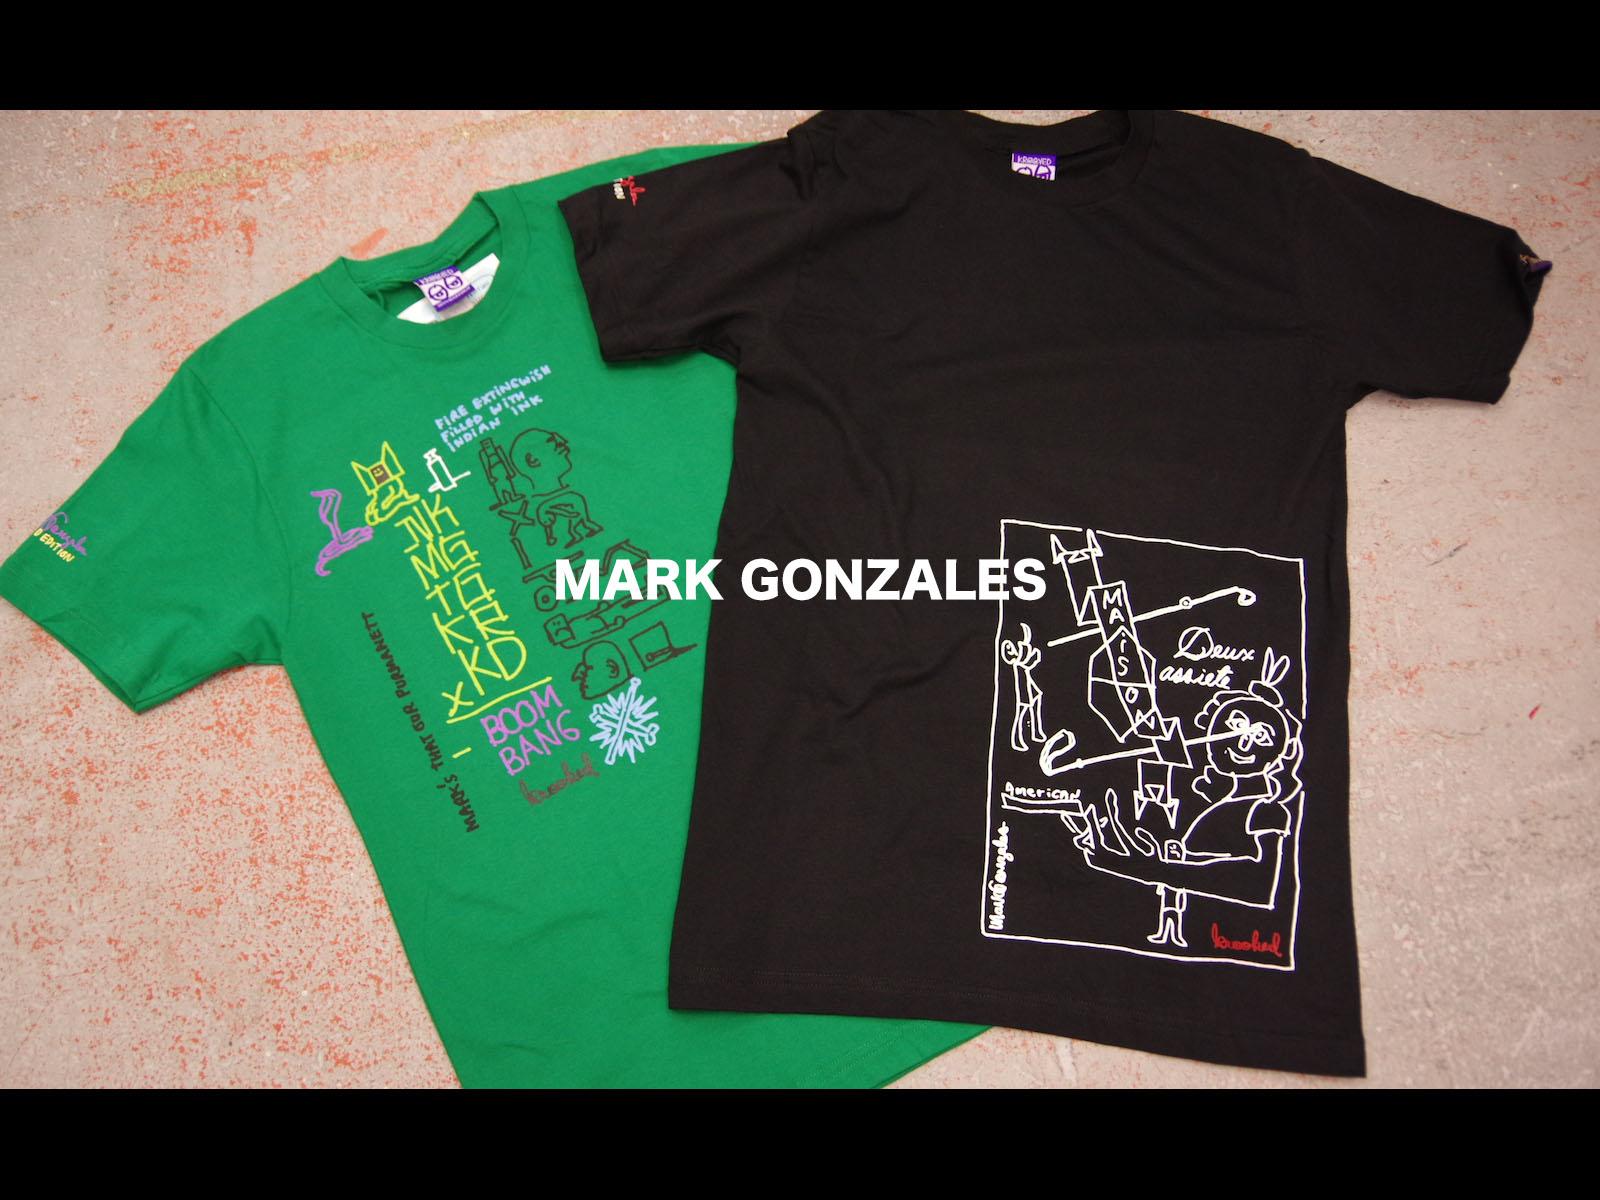 ARTIST: MARK GONZALES